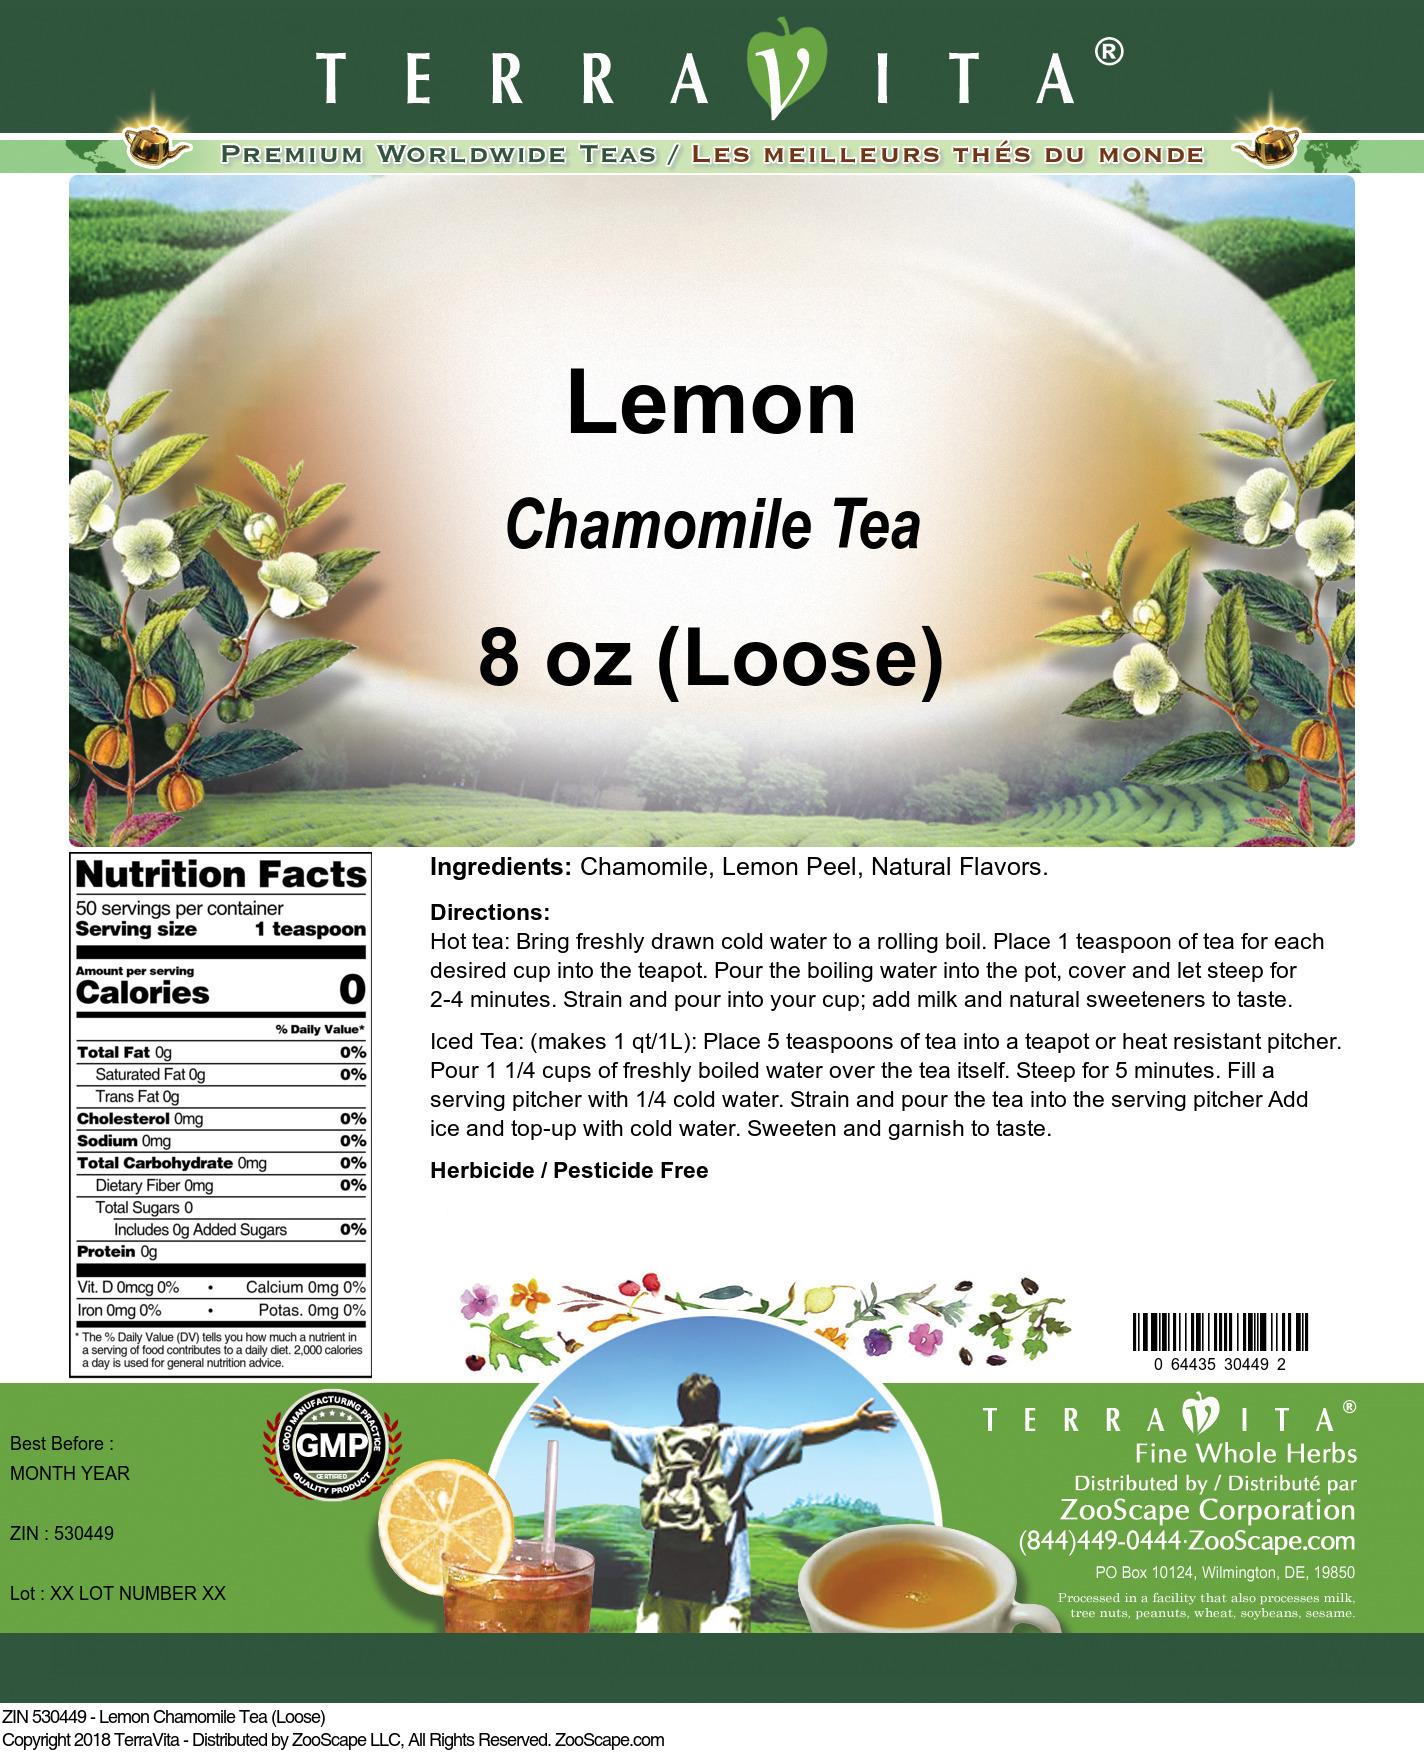 Lemon Chamomile Tea (Loose)